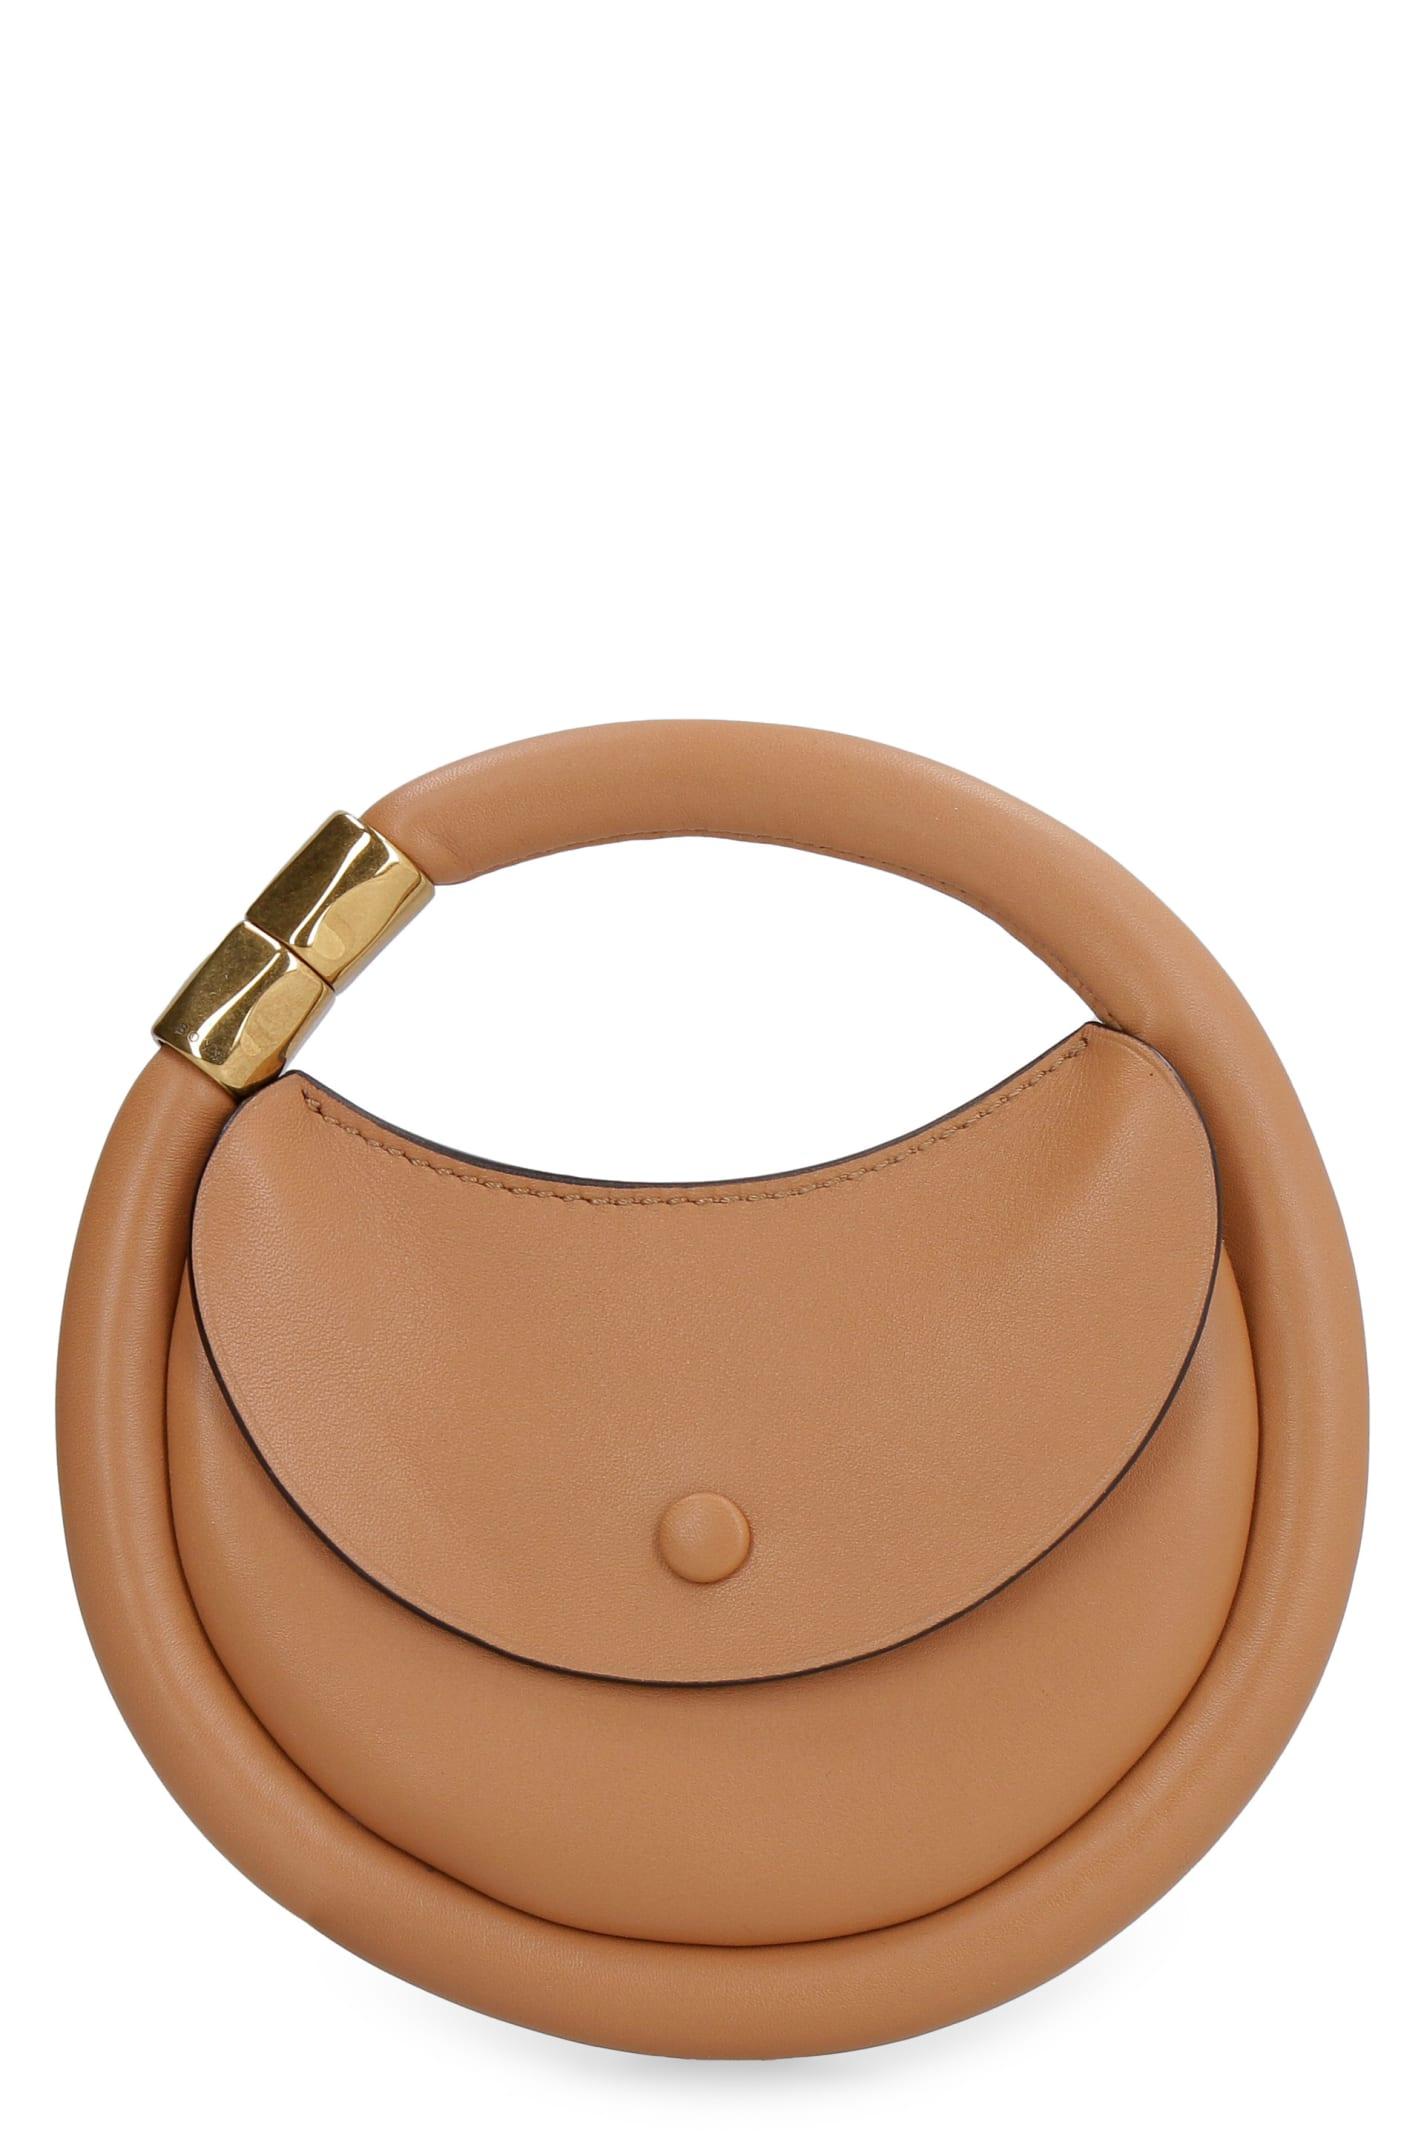 Disc Leather Purse